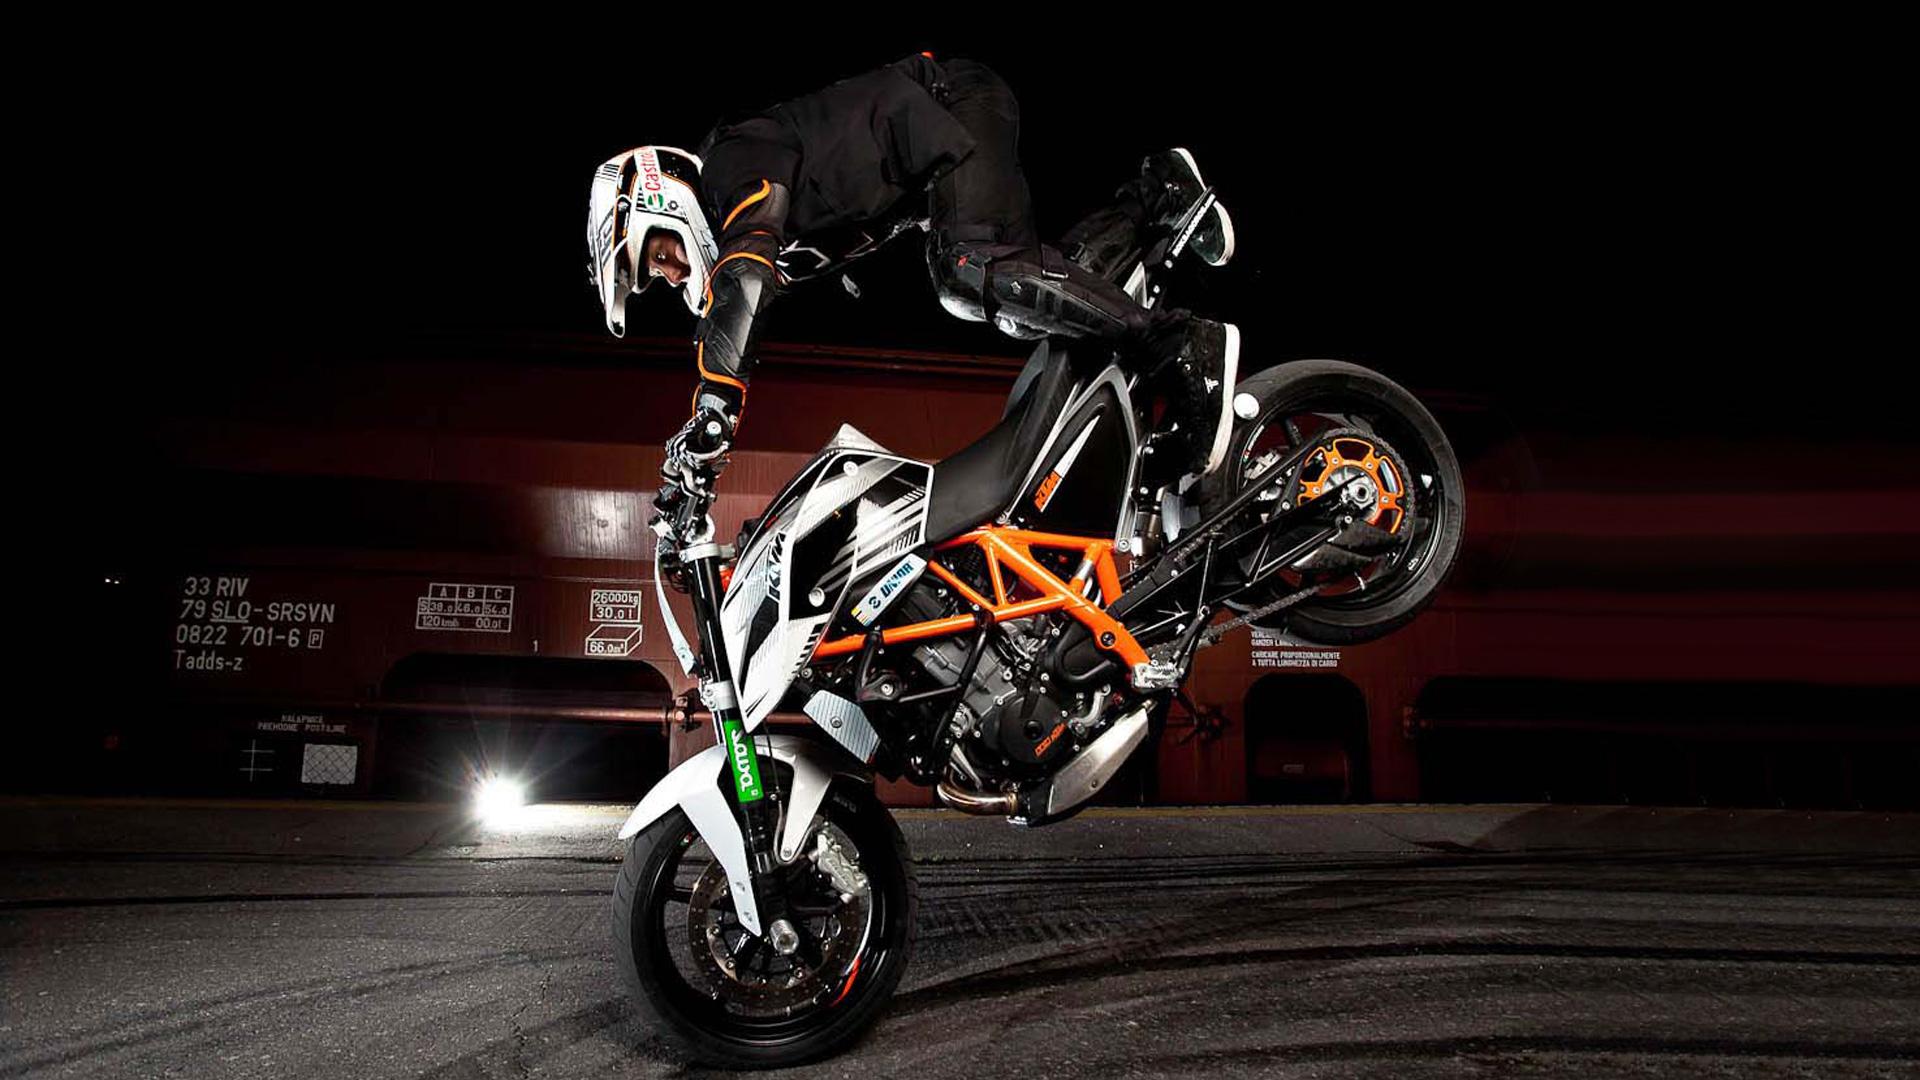 Bike Stunt Wallpaper